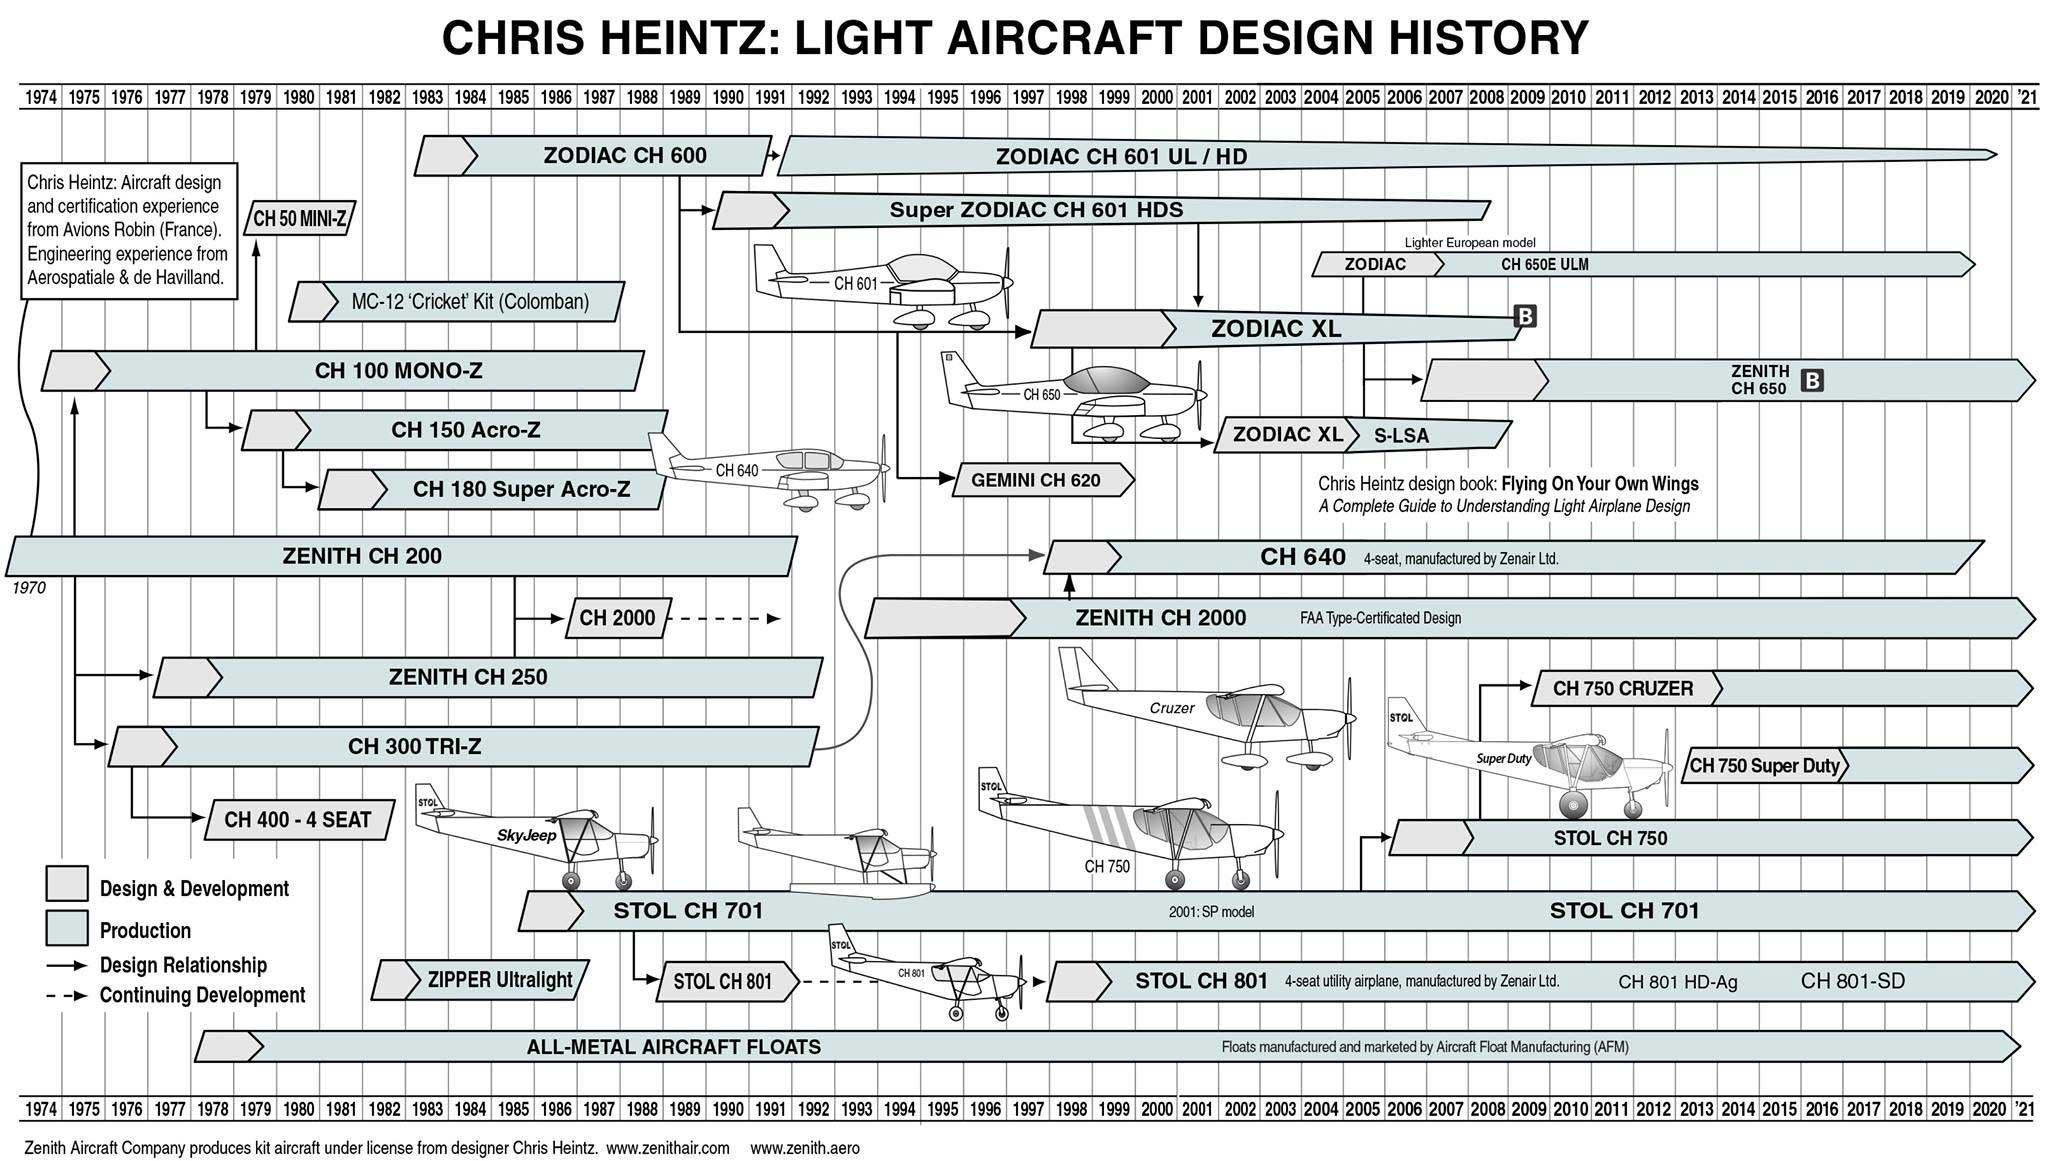 Chris Heintz aircraft